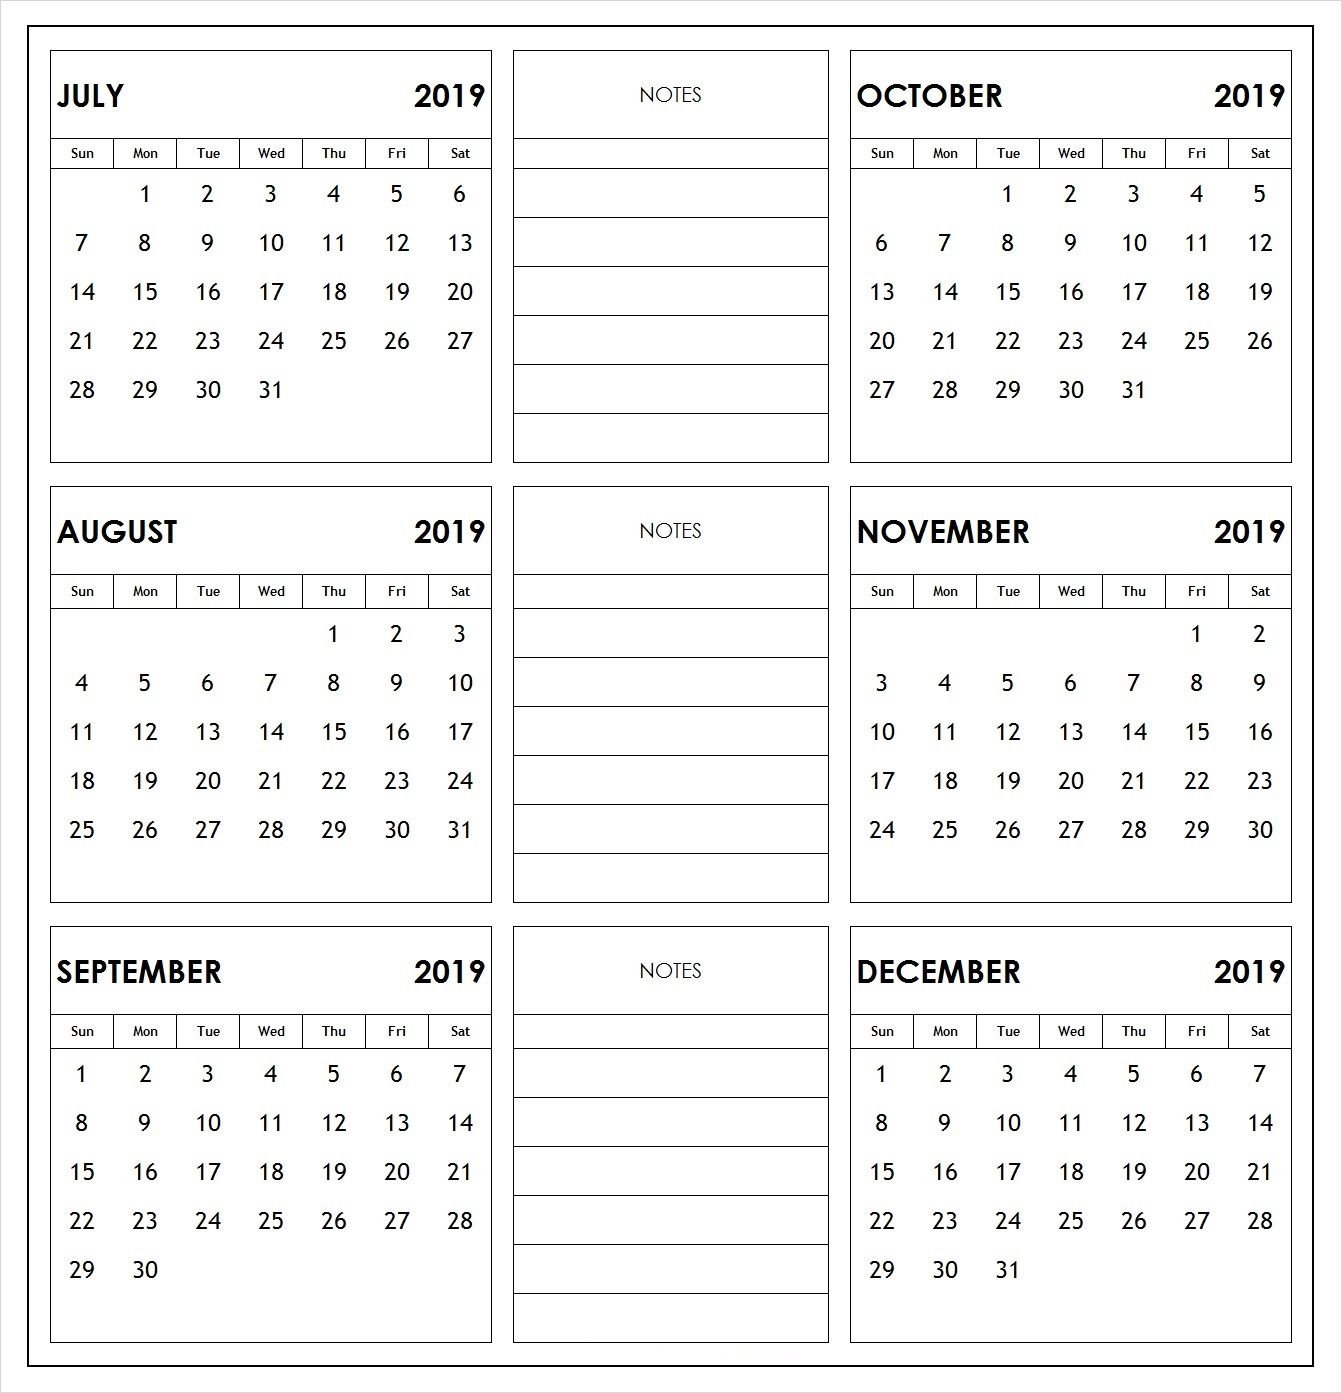 2019 Half Year Print Calendar | 2019 Calendars | Academic Calendar Printable Calendar 2019 6 Months